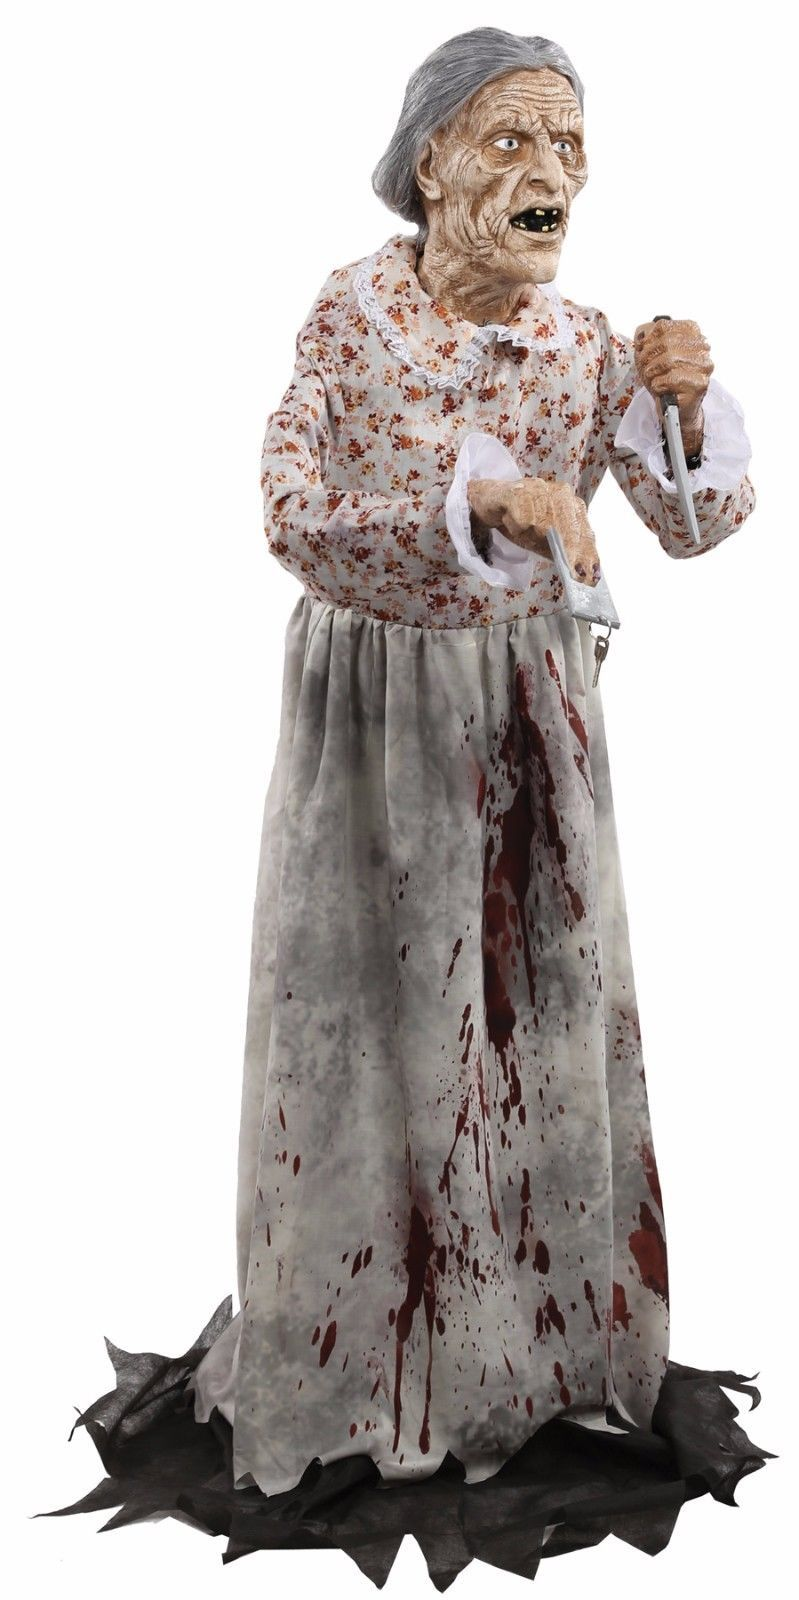 Granny Bates Halloween Prop Lifesize 5 feet Poseable Haunted House Decoration